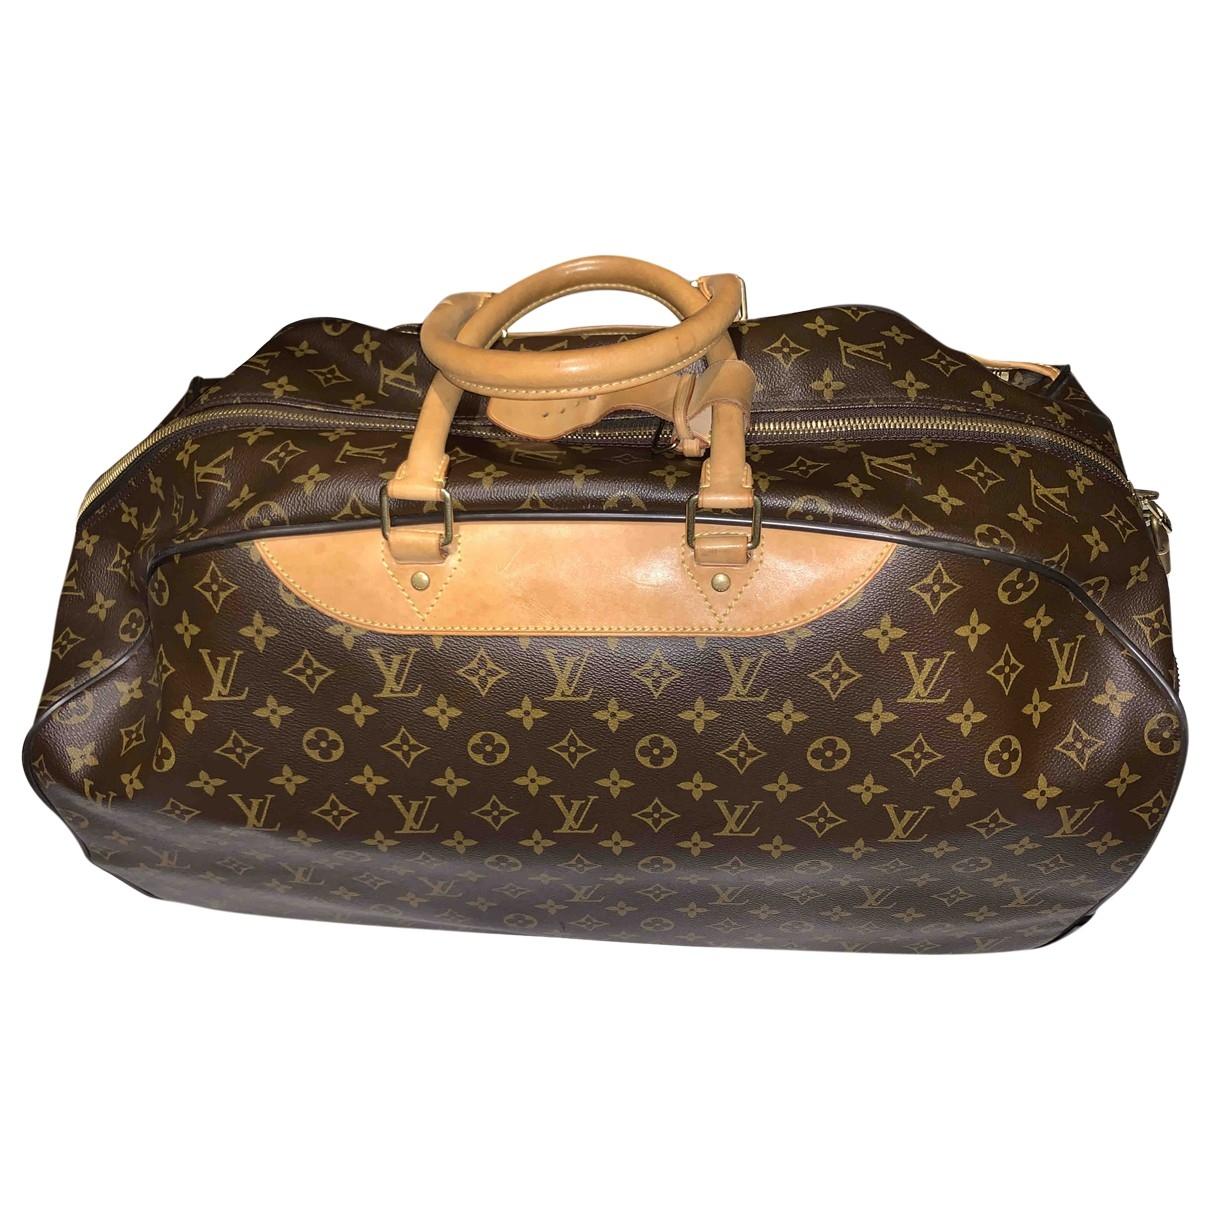 Bolso de viaje Eole de Cuero Louis Vuitton